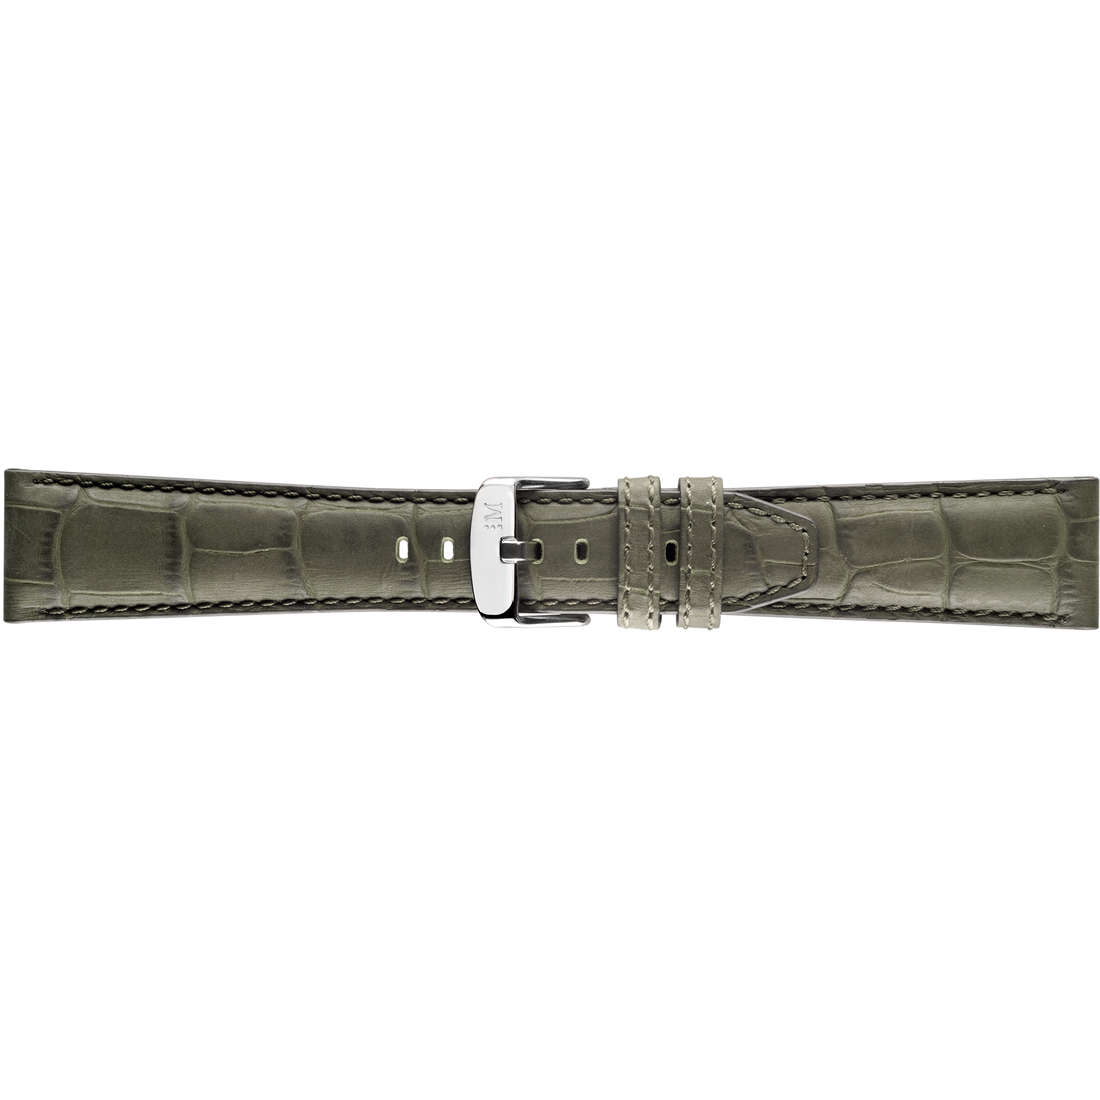 watch watch bands watch straps man Morellato Linea Sport A01X4497B44073CR22